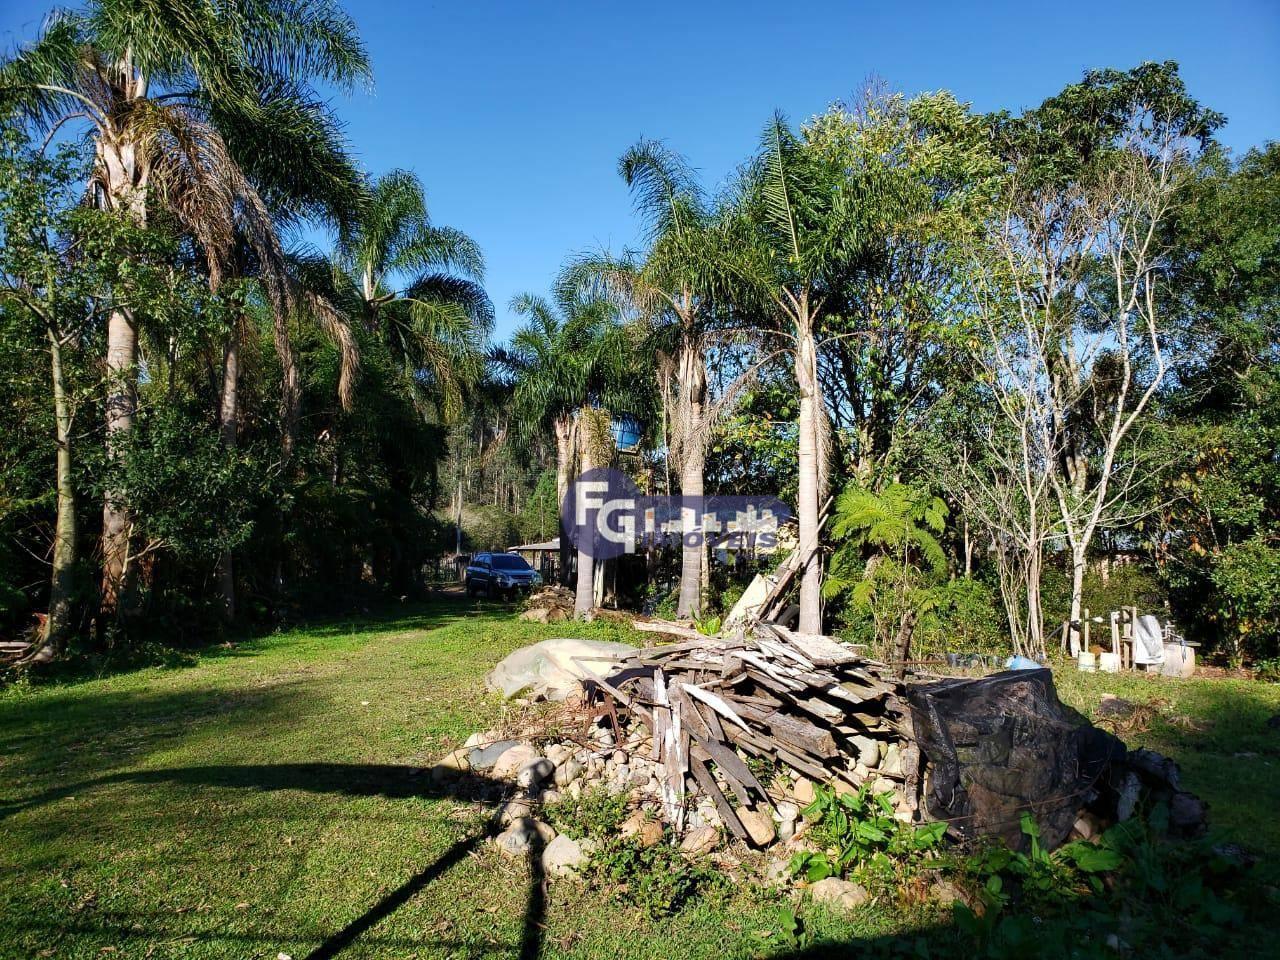 Chácara à venda, 8504 m² por R$ 480.000 - Zona Rural - Tijucas do Sul/PR